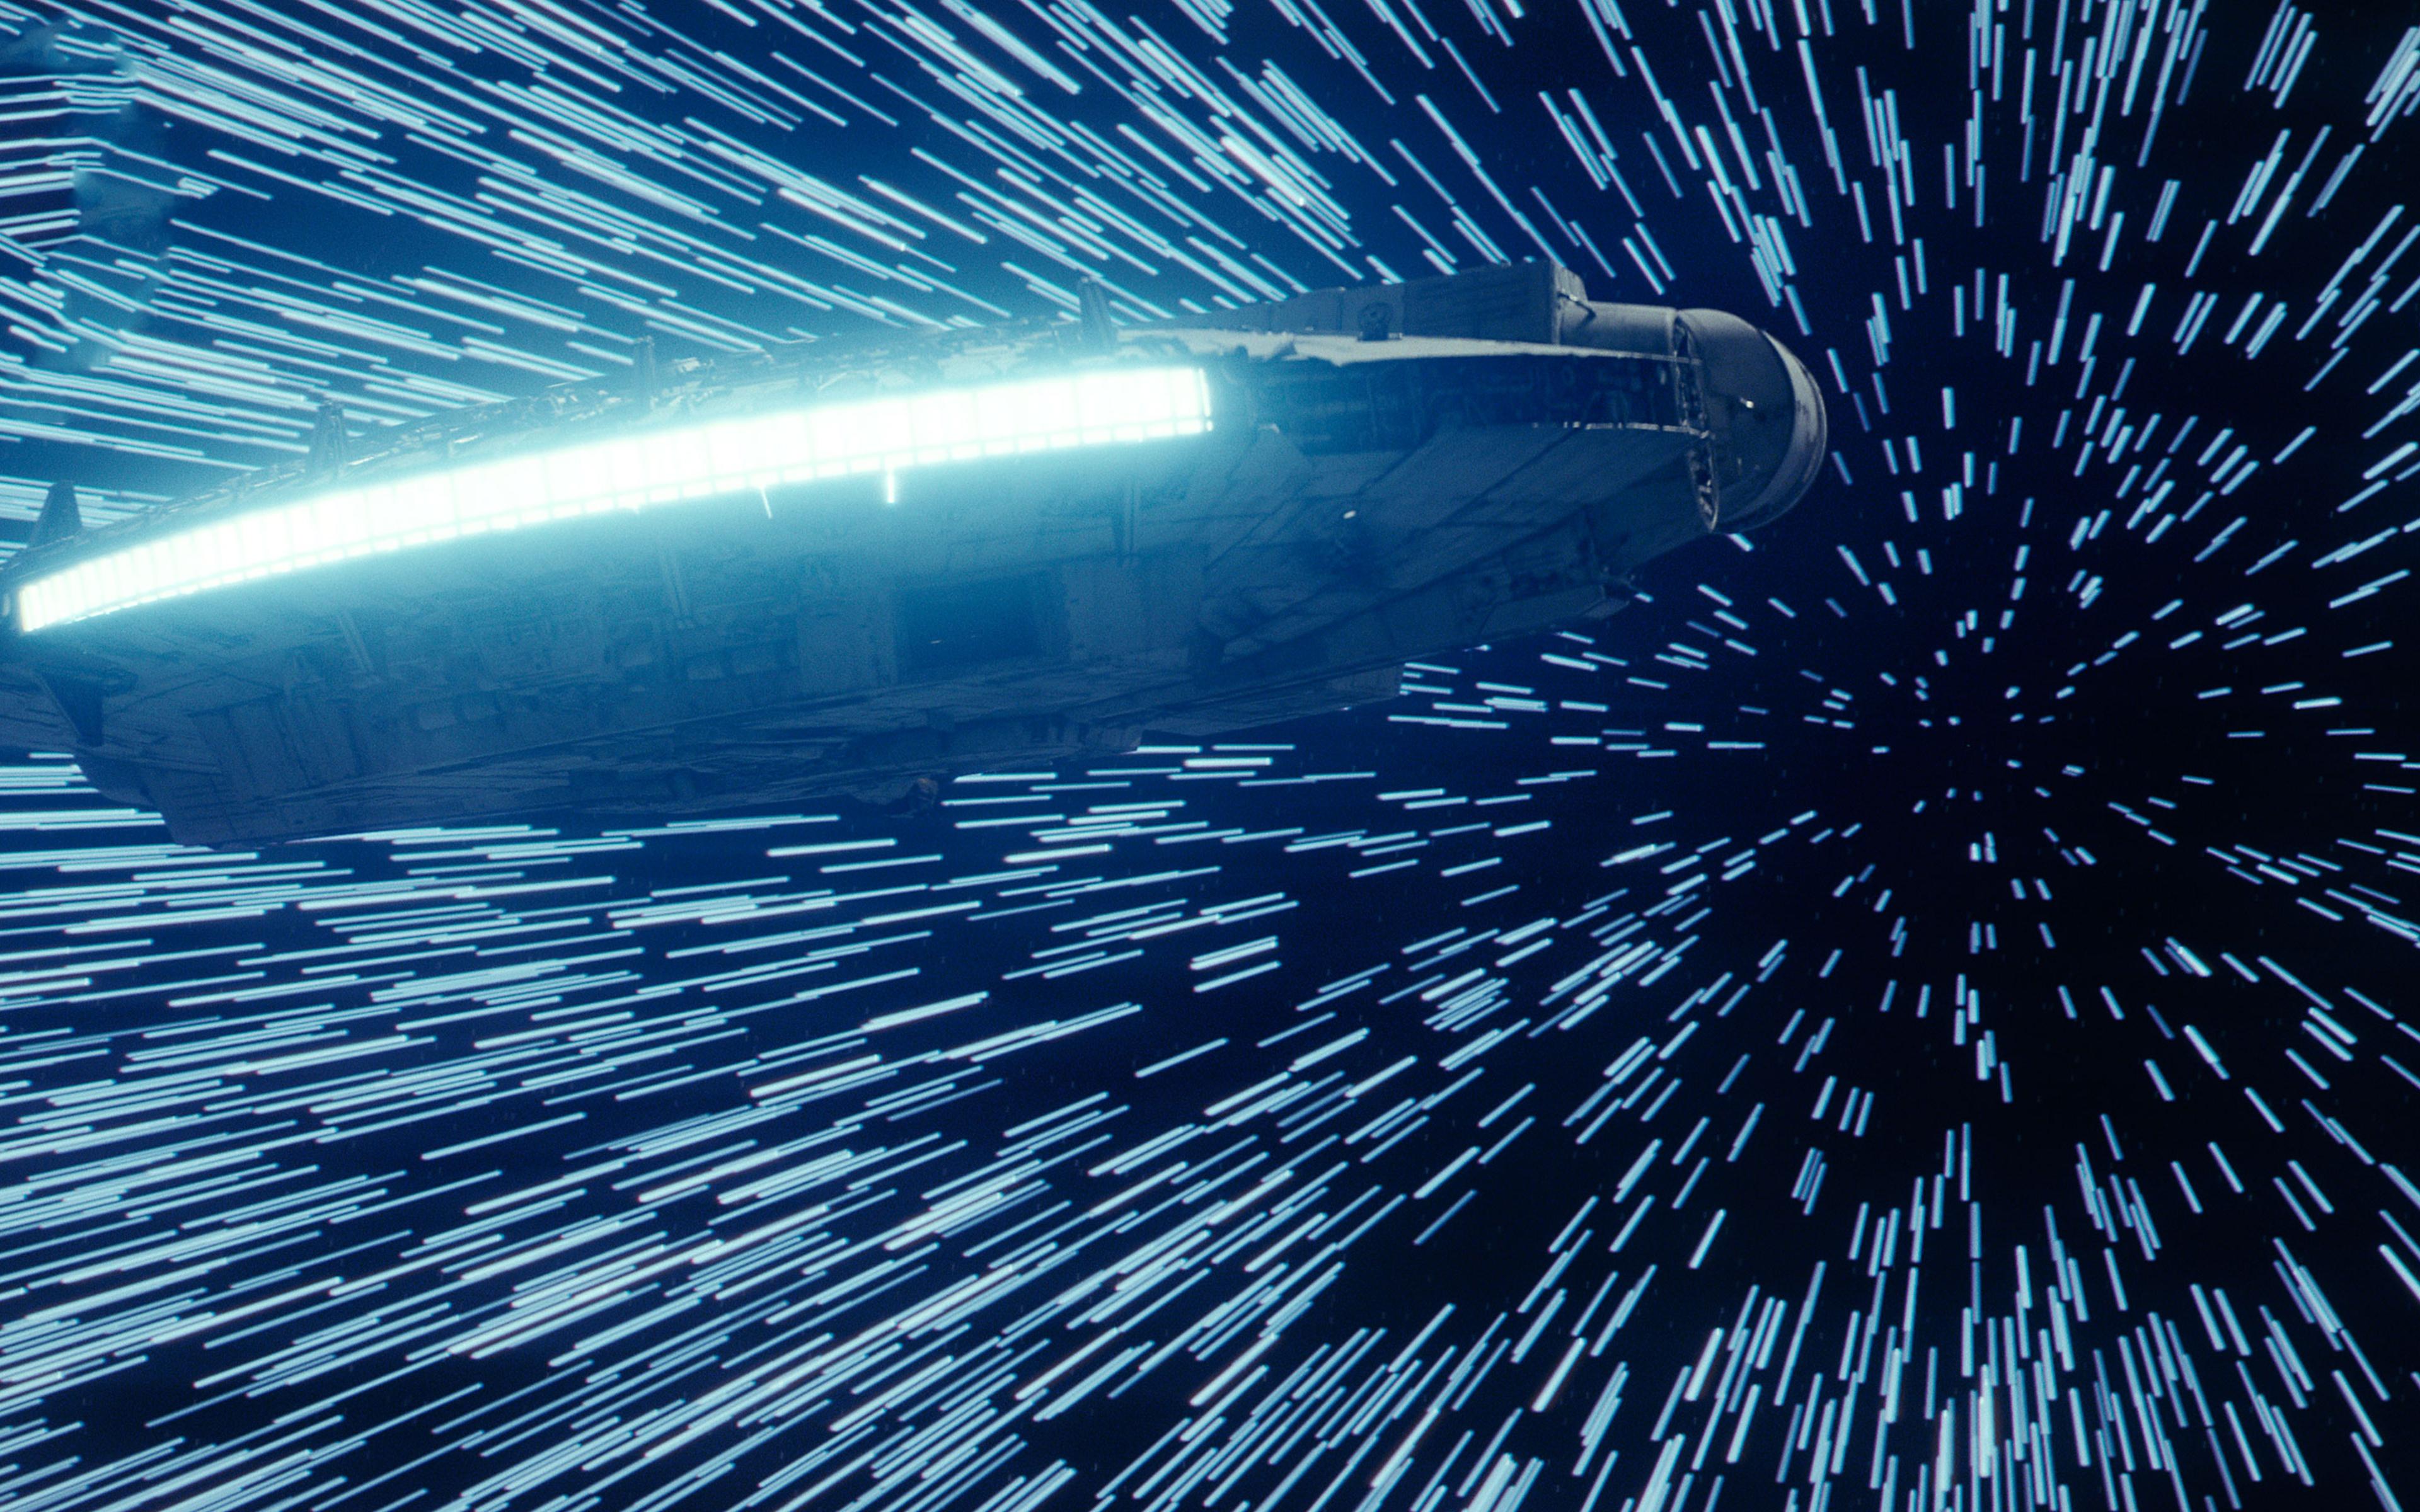 star-wars-the-last-jedi-millennium-falcon-hitting-lightspeed-35.jpg